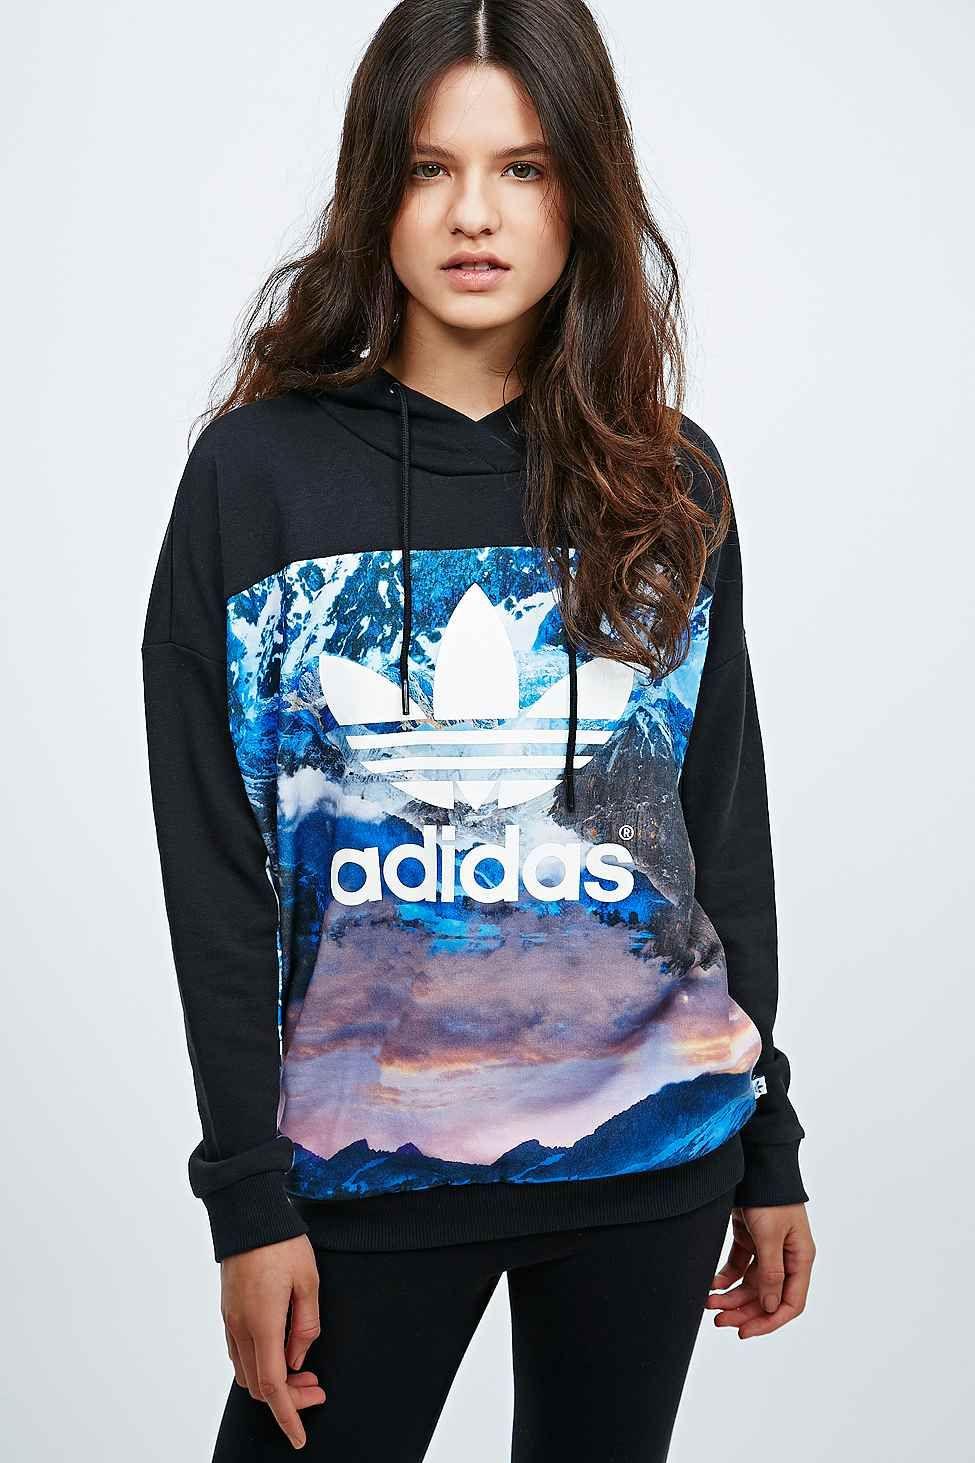 Adidas Mountain Clash Hoodie Hoodies Urban Fashion Fashion [ 1463 x 975 Pixel ]